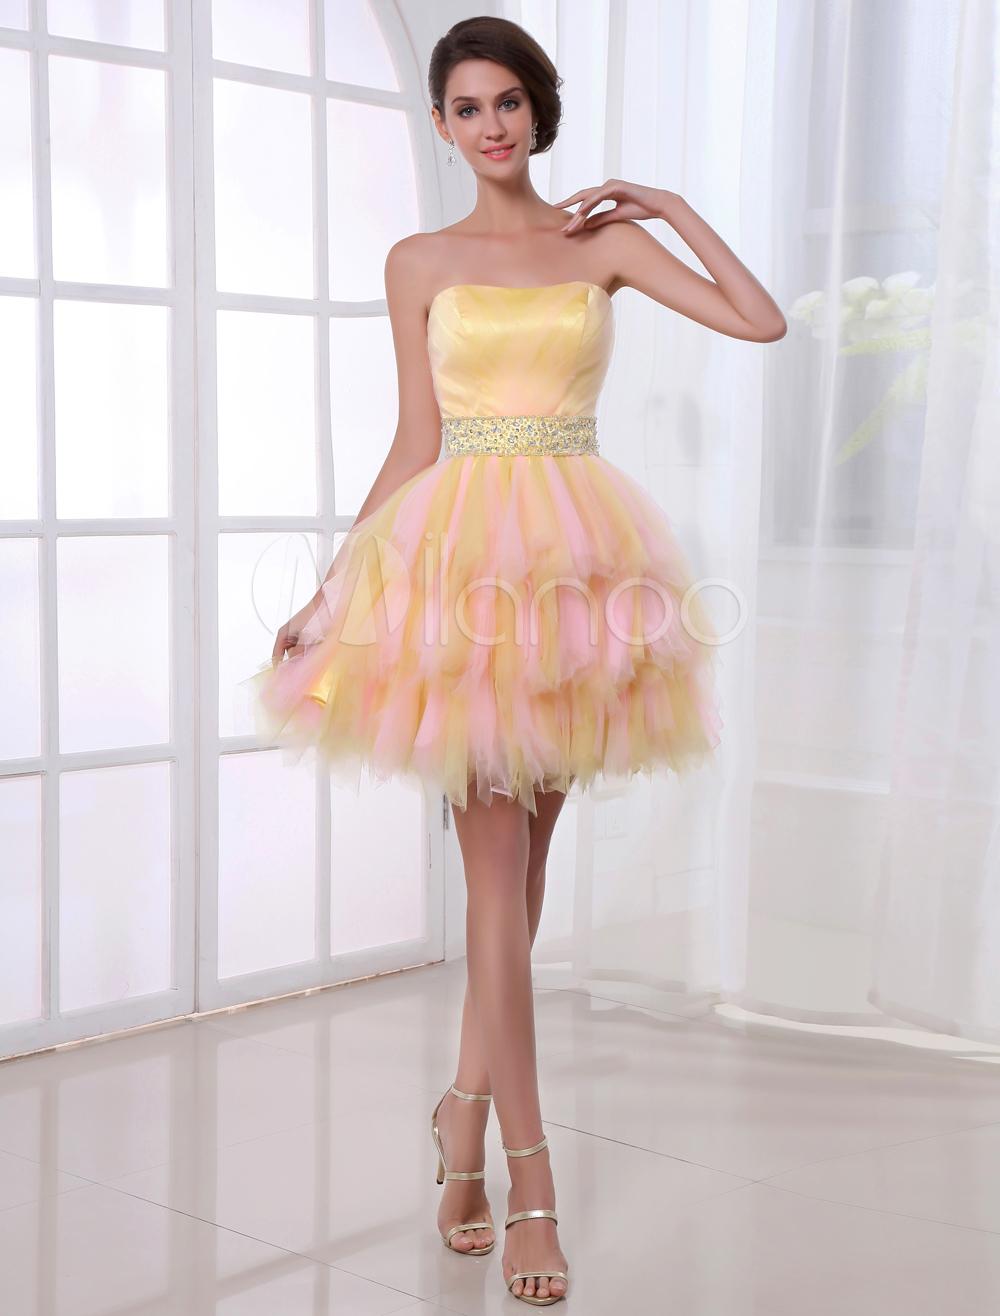 Cute A-line Net Beading Strapless Short Prom Dress (Wedding Prom Dresses) photo